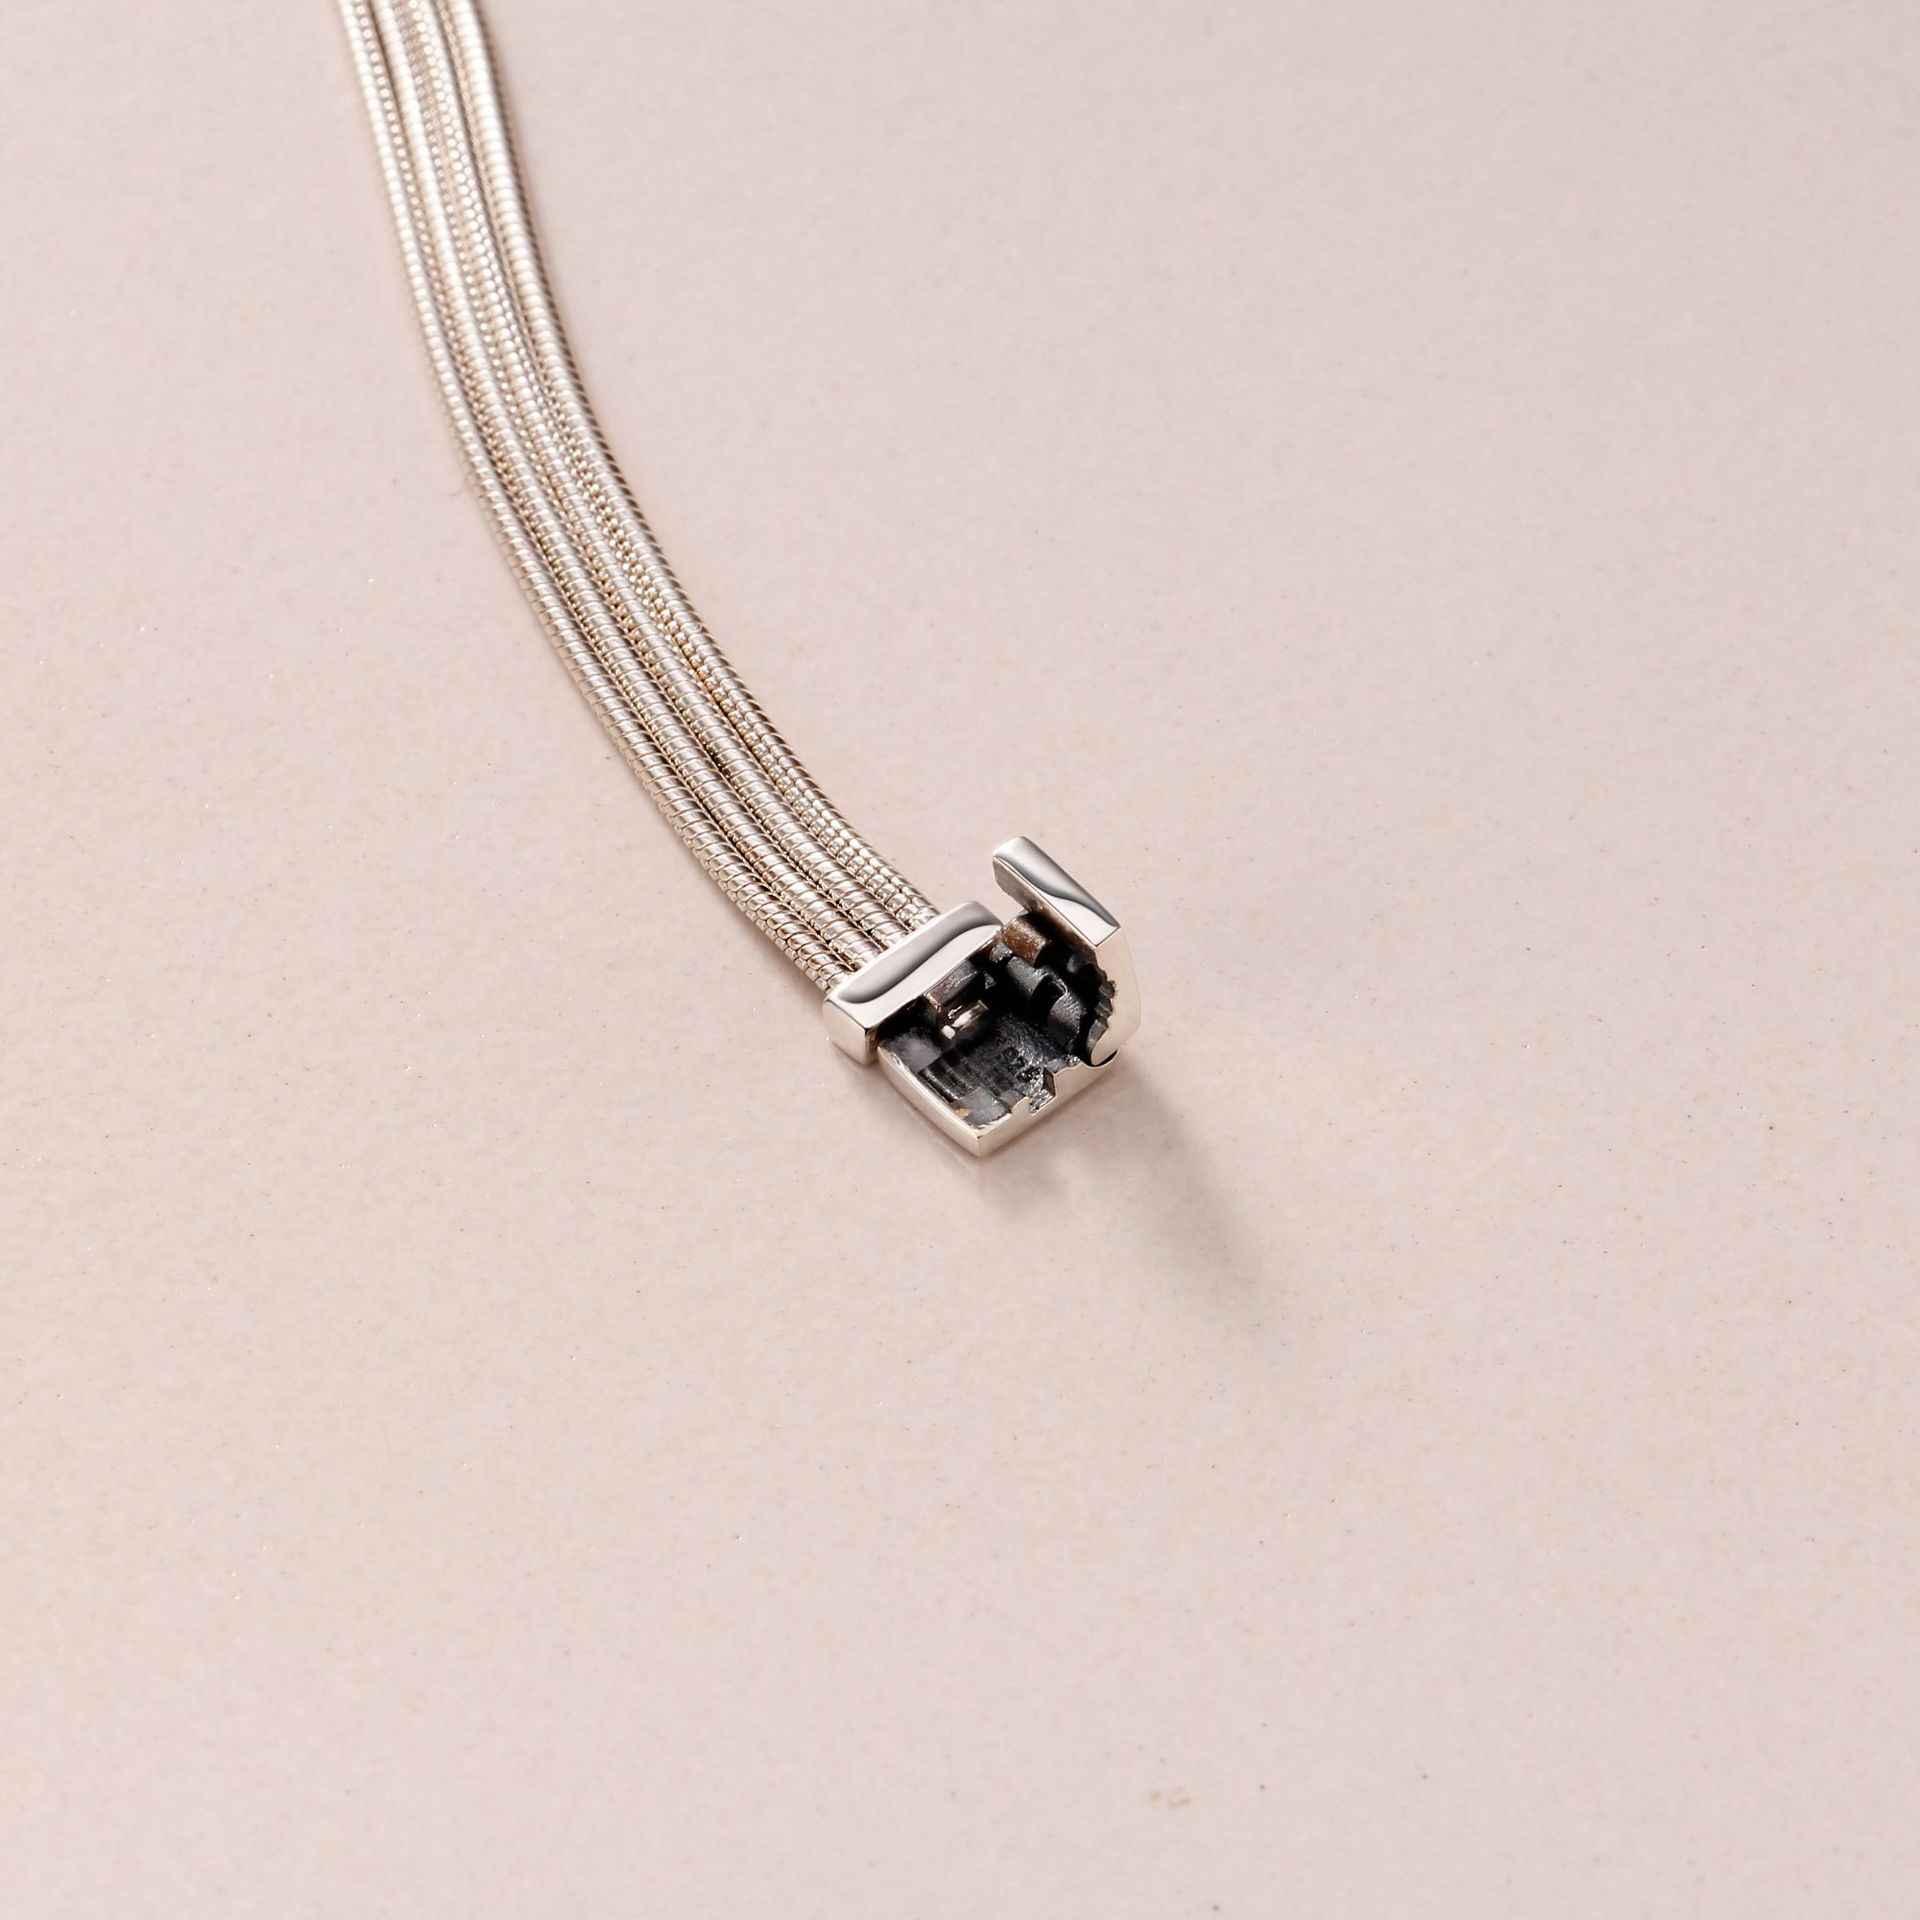 Original 925 Sterling Silber Armband Reflexions Multi Schlange Kette Armband Armreif Fit Frauen Perle Charme Diy Mode Schmuck